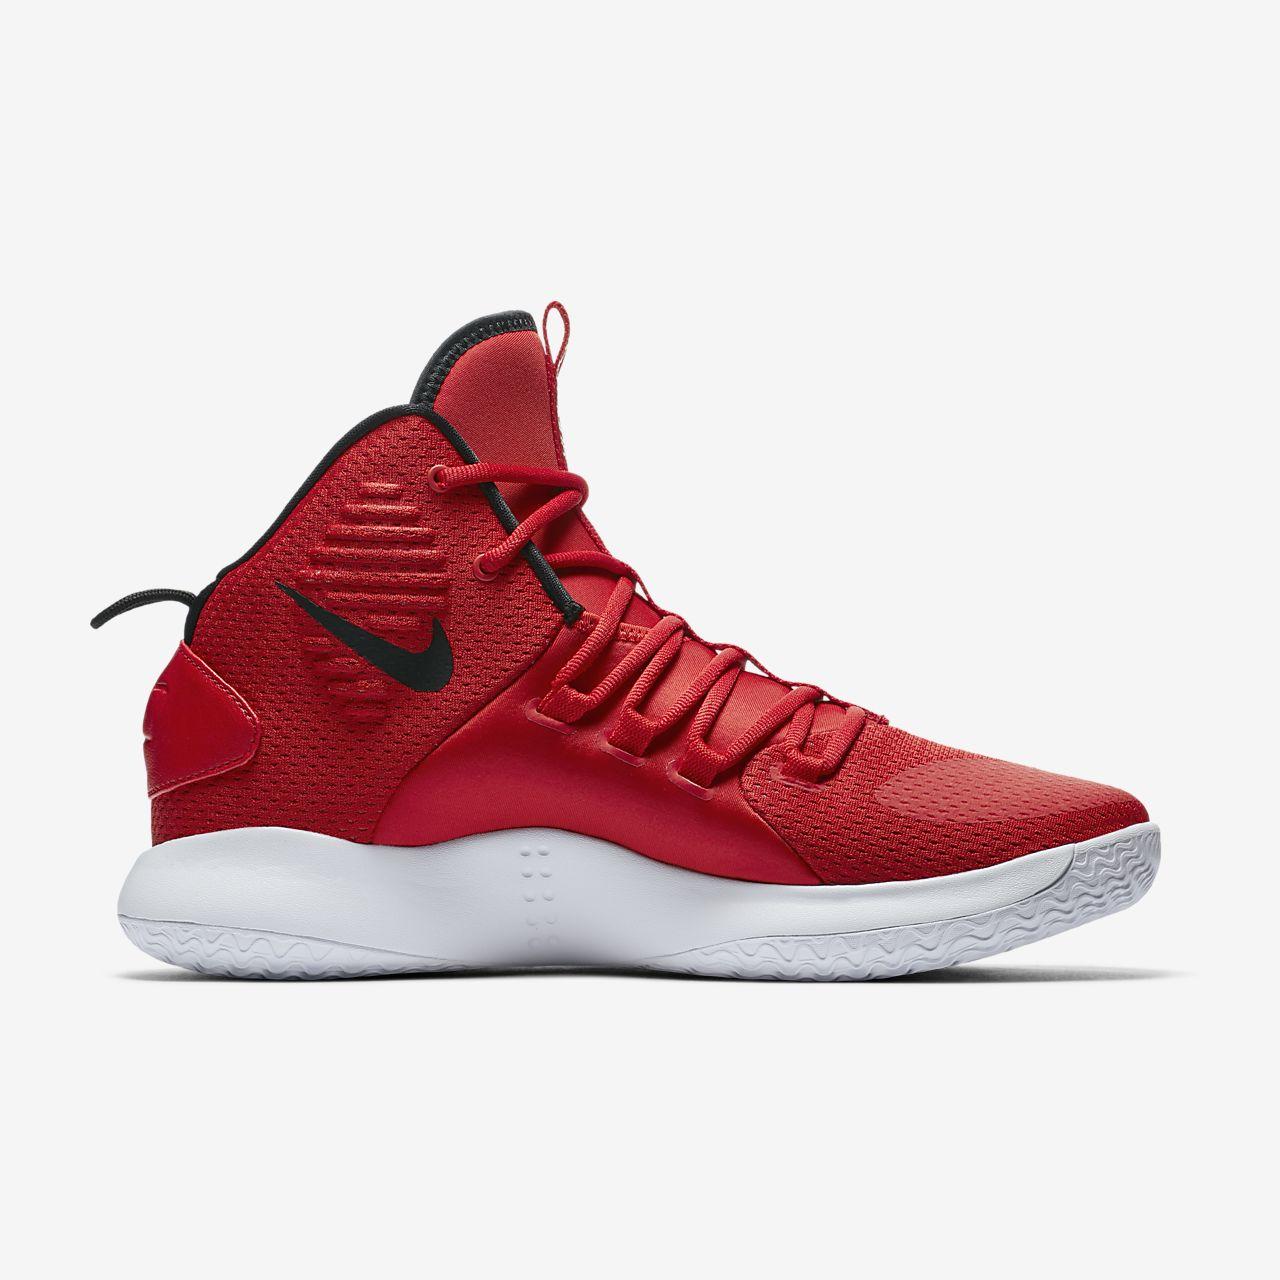 f2111d59a3cf Low Resolution Nike Hyperdunk X TB Basketball Shoe Nike Hyperdunk X TB  Basketball Shoe